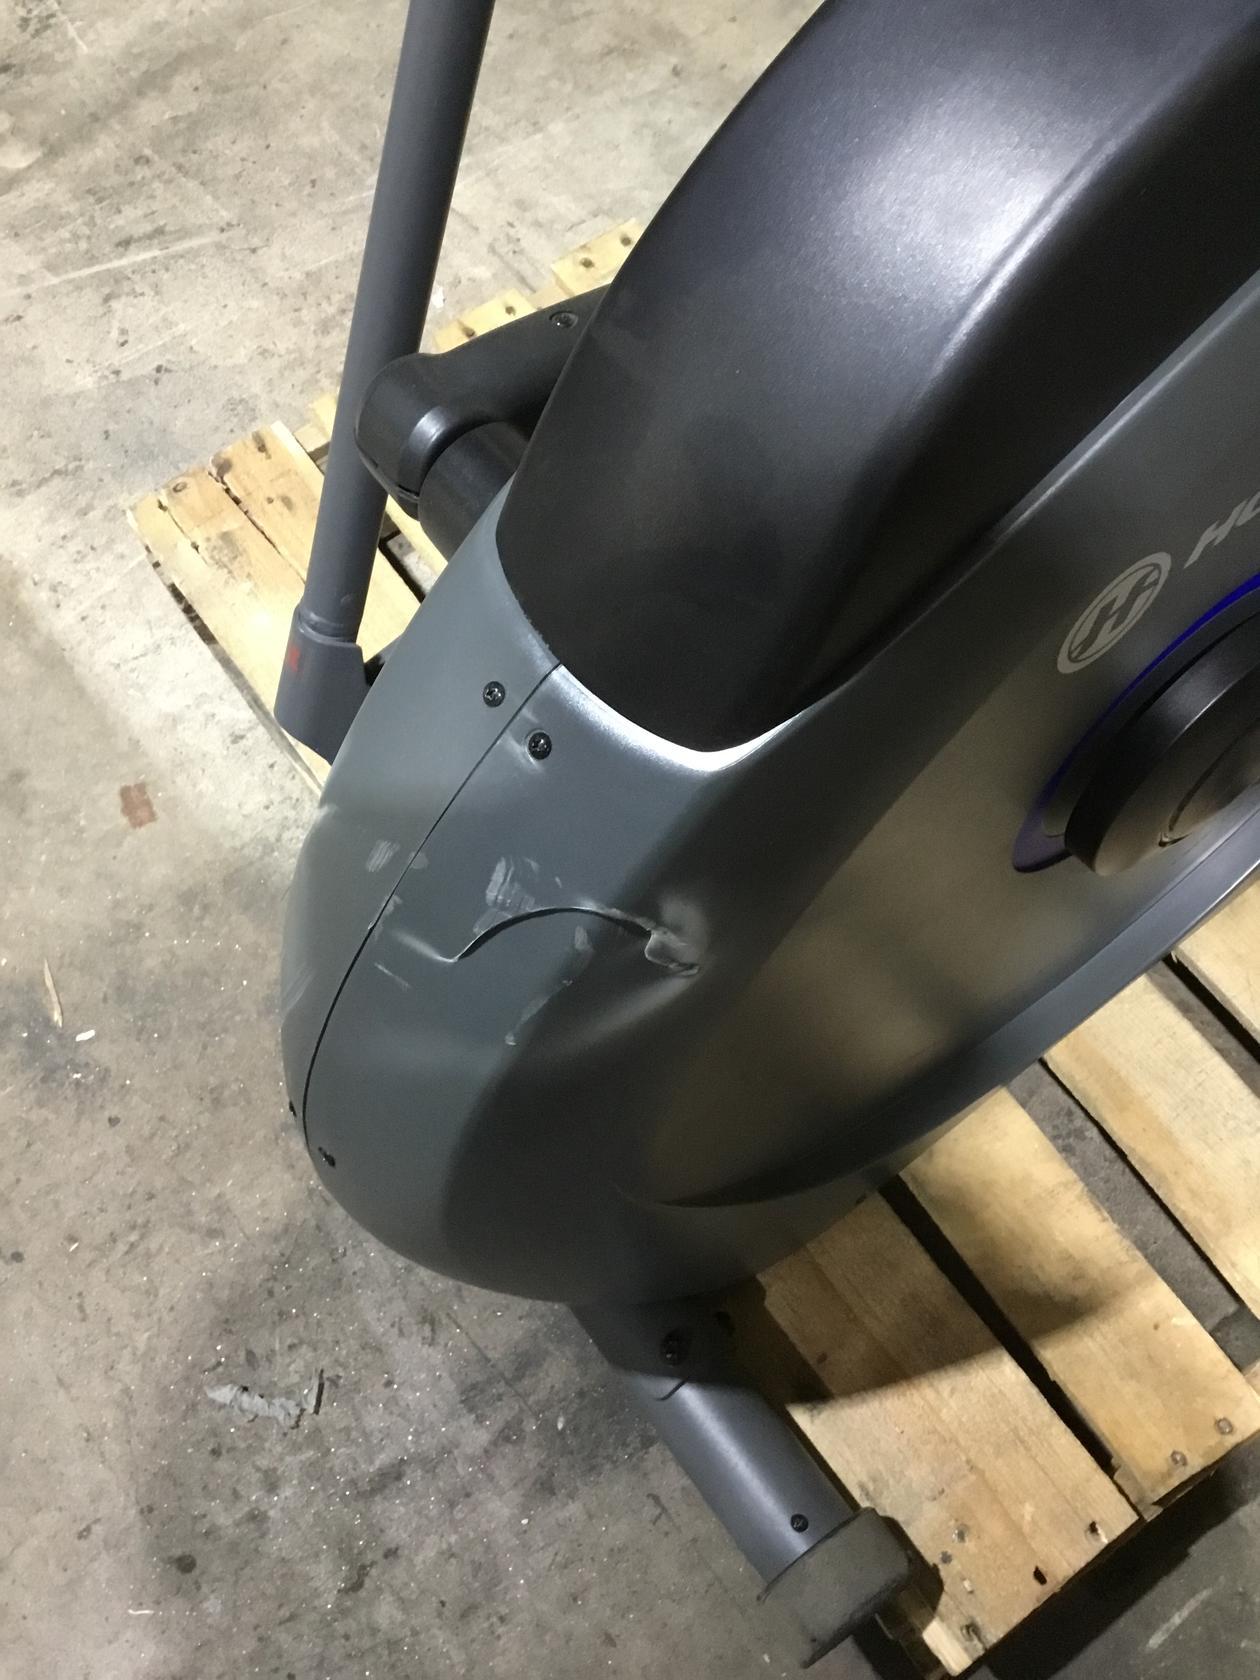 Horizon Fitness EX-59 Elliptical(CONTROL PANEL NOT WORKING)